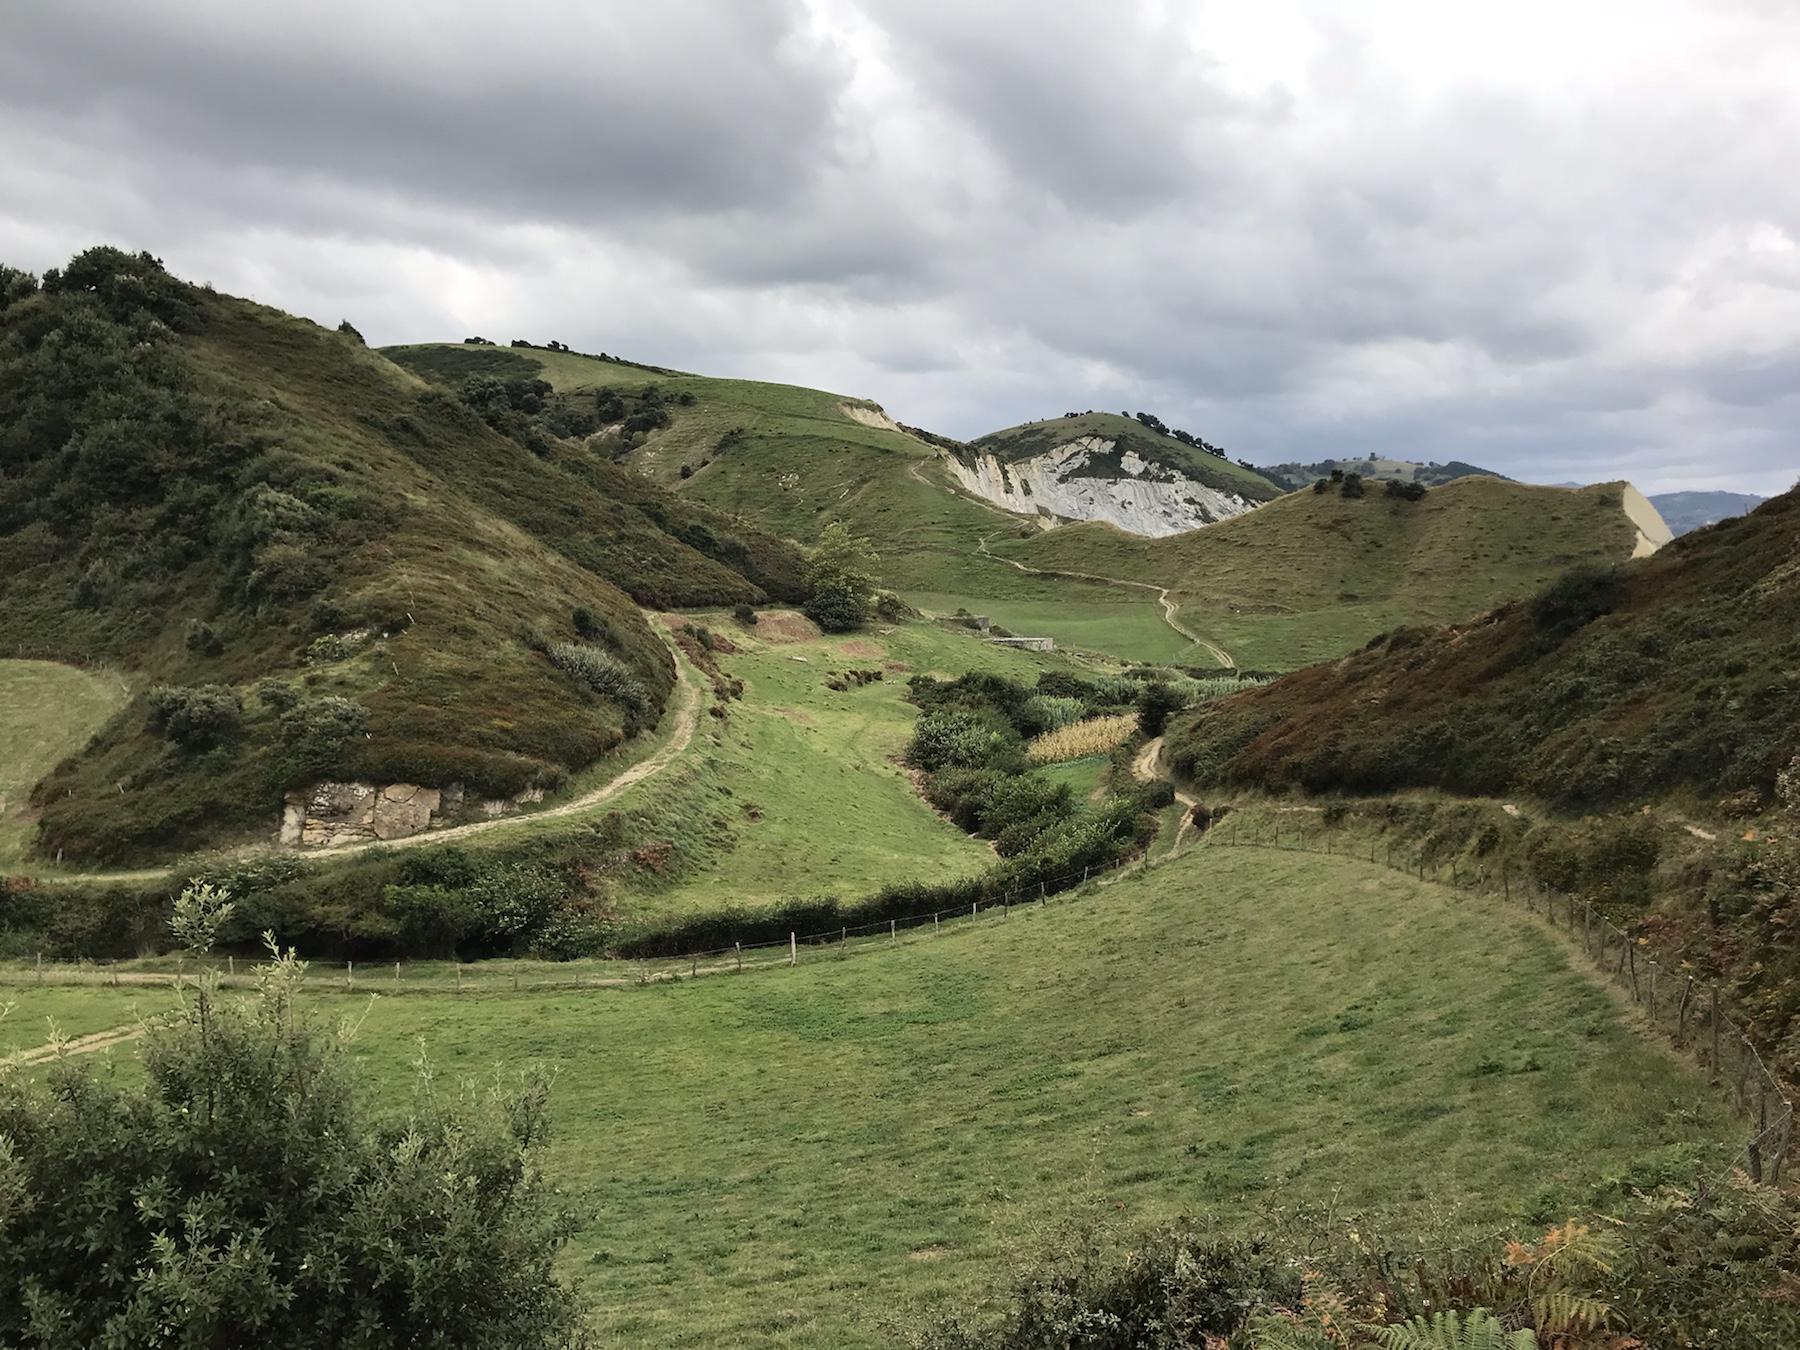 E9 statt Camino del Norte, Kategorie Landschaft #fopanet Fotoparade